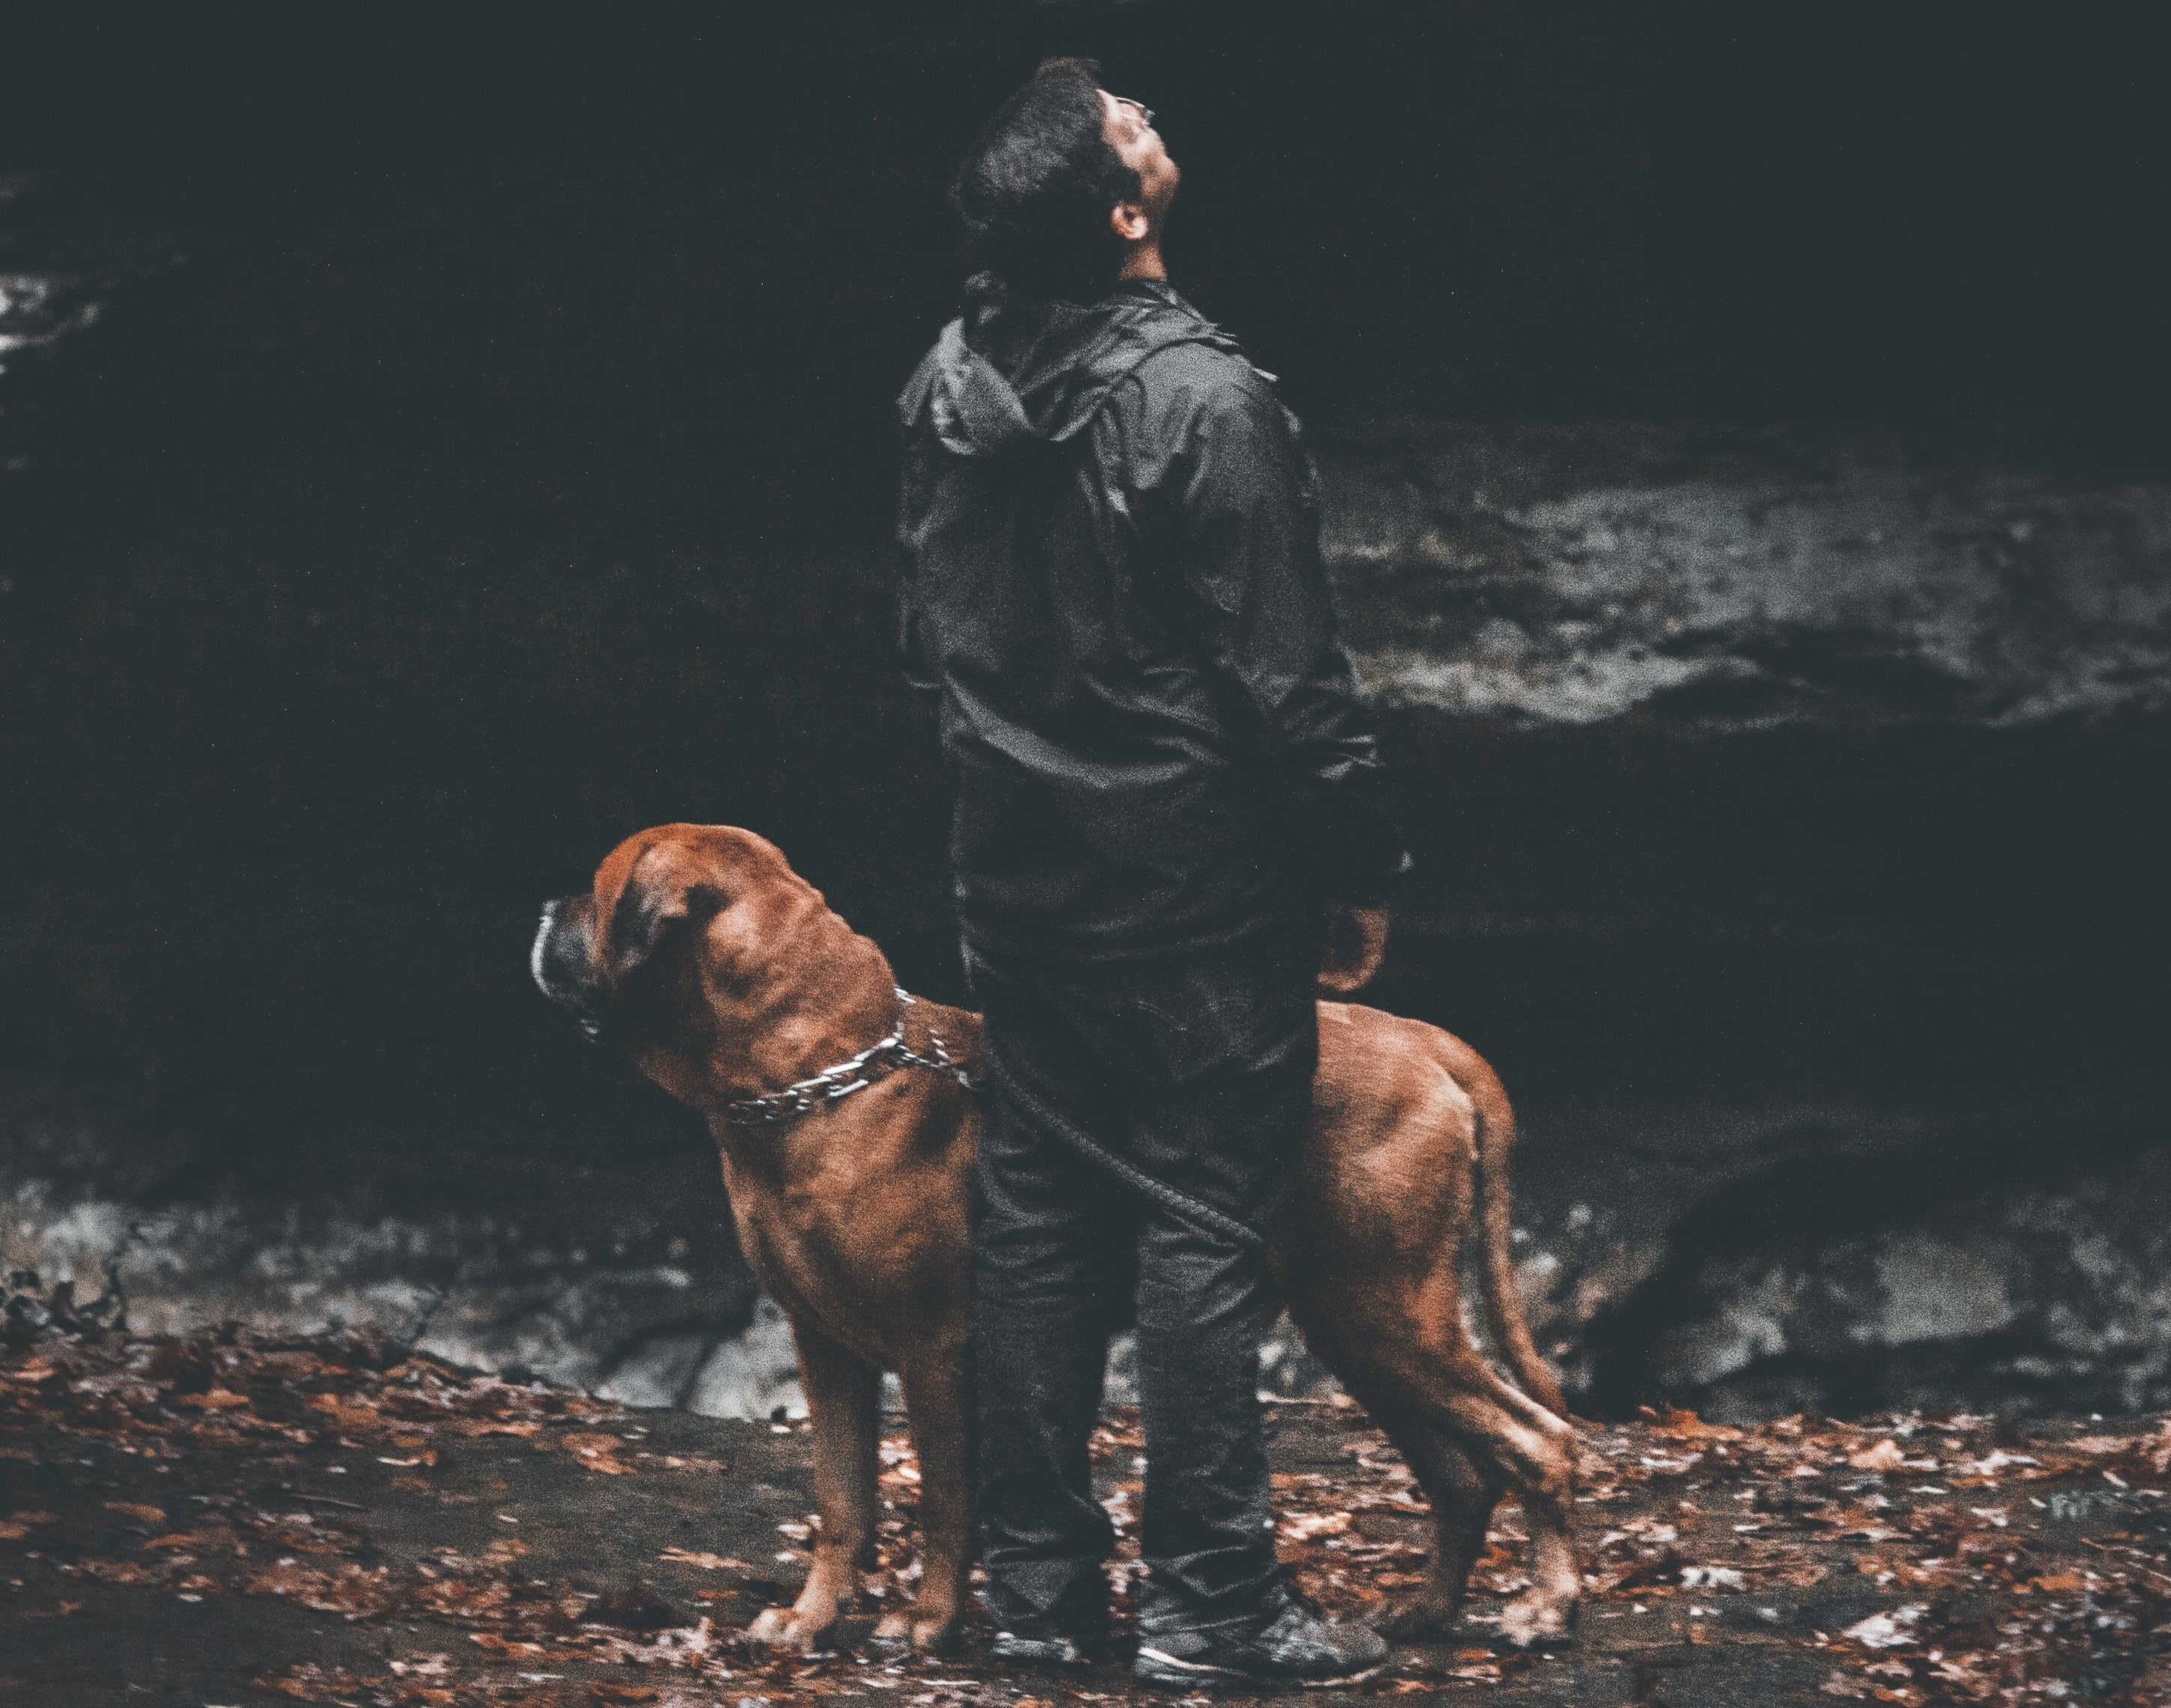 Man in Rain Gear with Dog